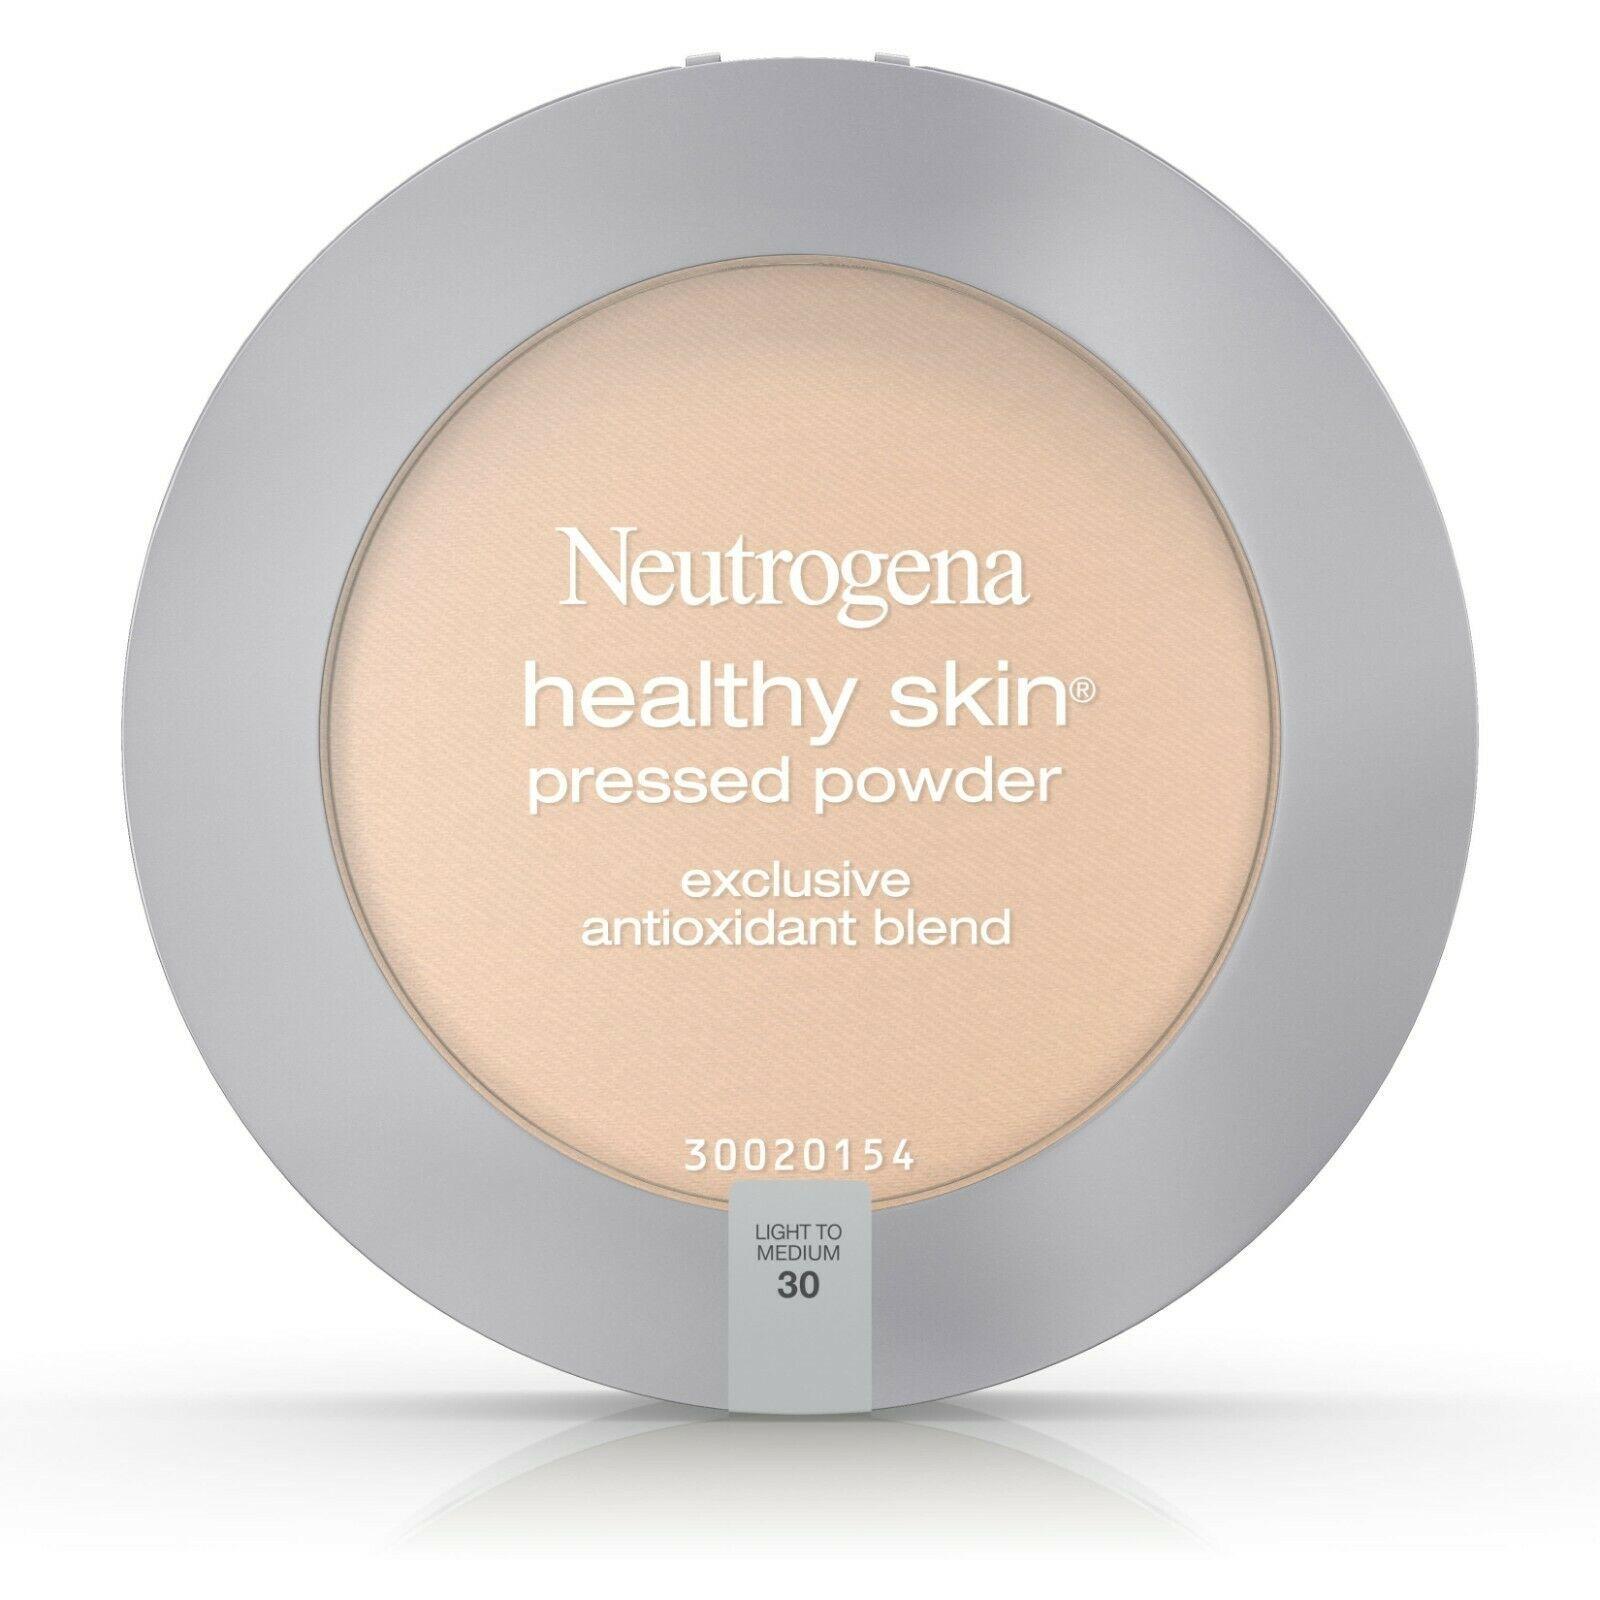 Neutrogena Healthy Skin Pressed Powder, Light to Medium 30, 0.34 oz.. - $25.73